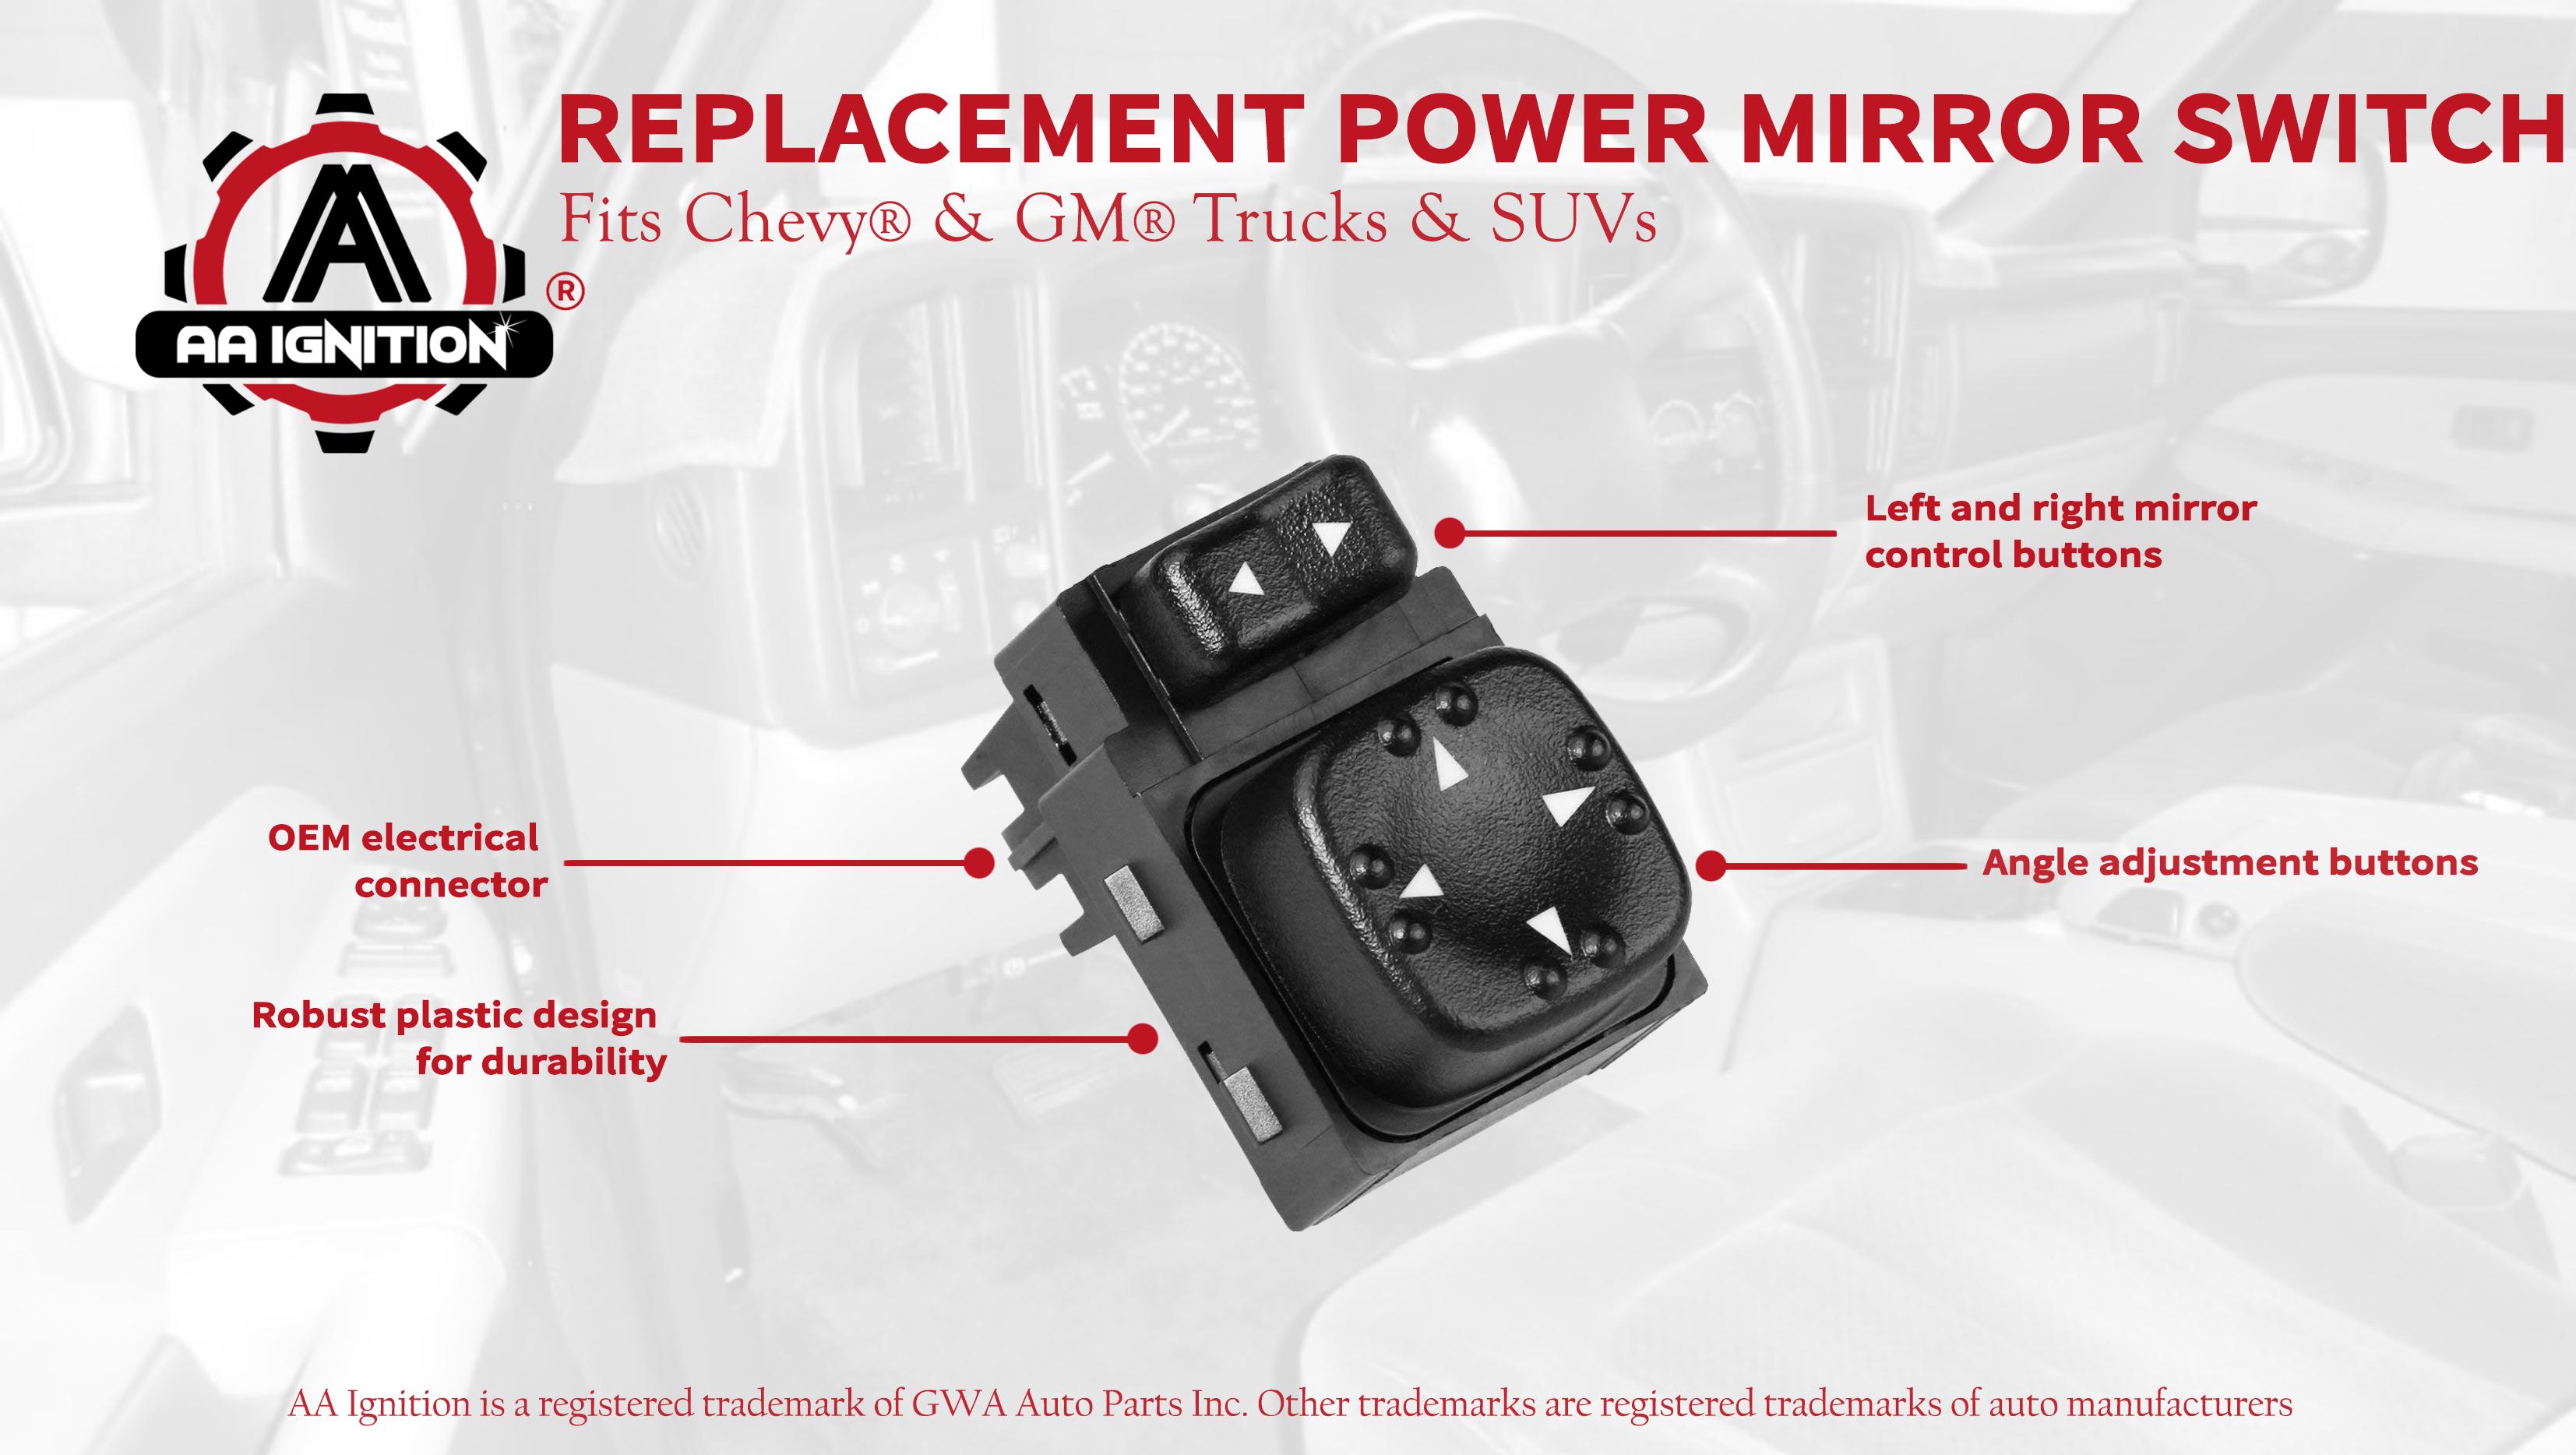 GMC 2500HD 15045085 901-124 Replacement(Black) 19259975 Power Mirror Switch for Chevy Chevrolet Silverado Sierra Tahoe Yukon Suburban